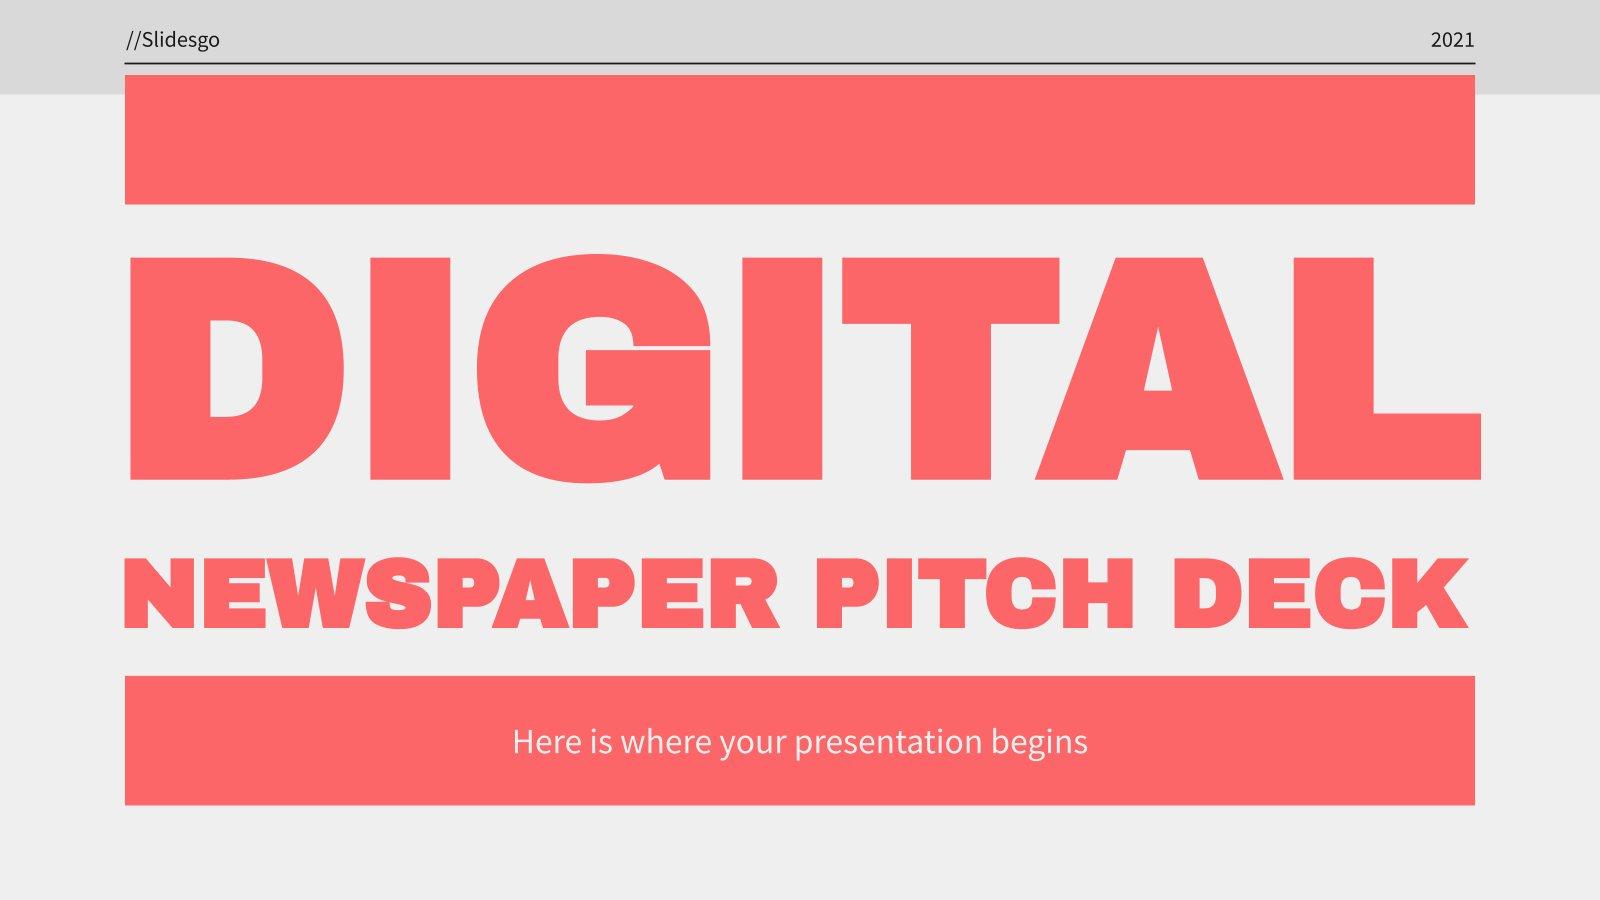 Digital Newspaper Pitch Deck presentation template